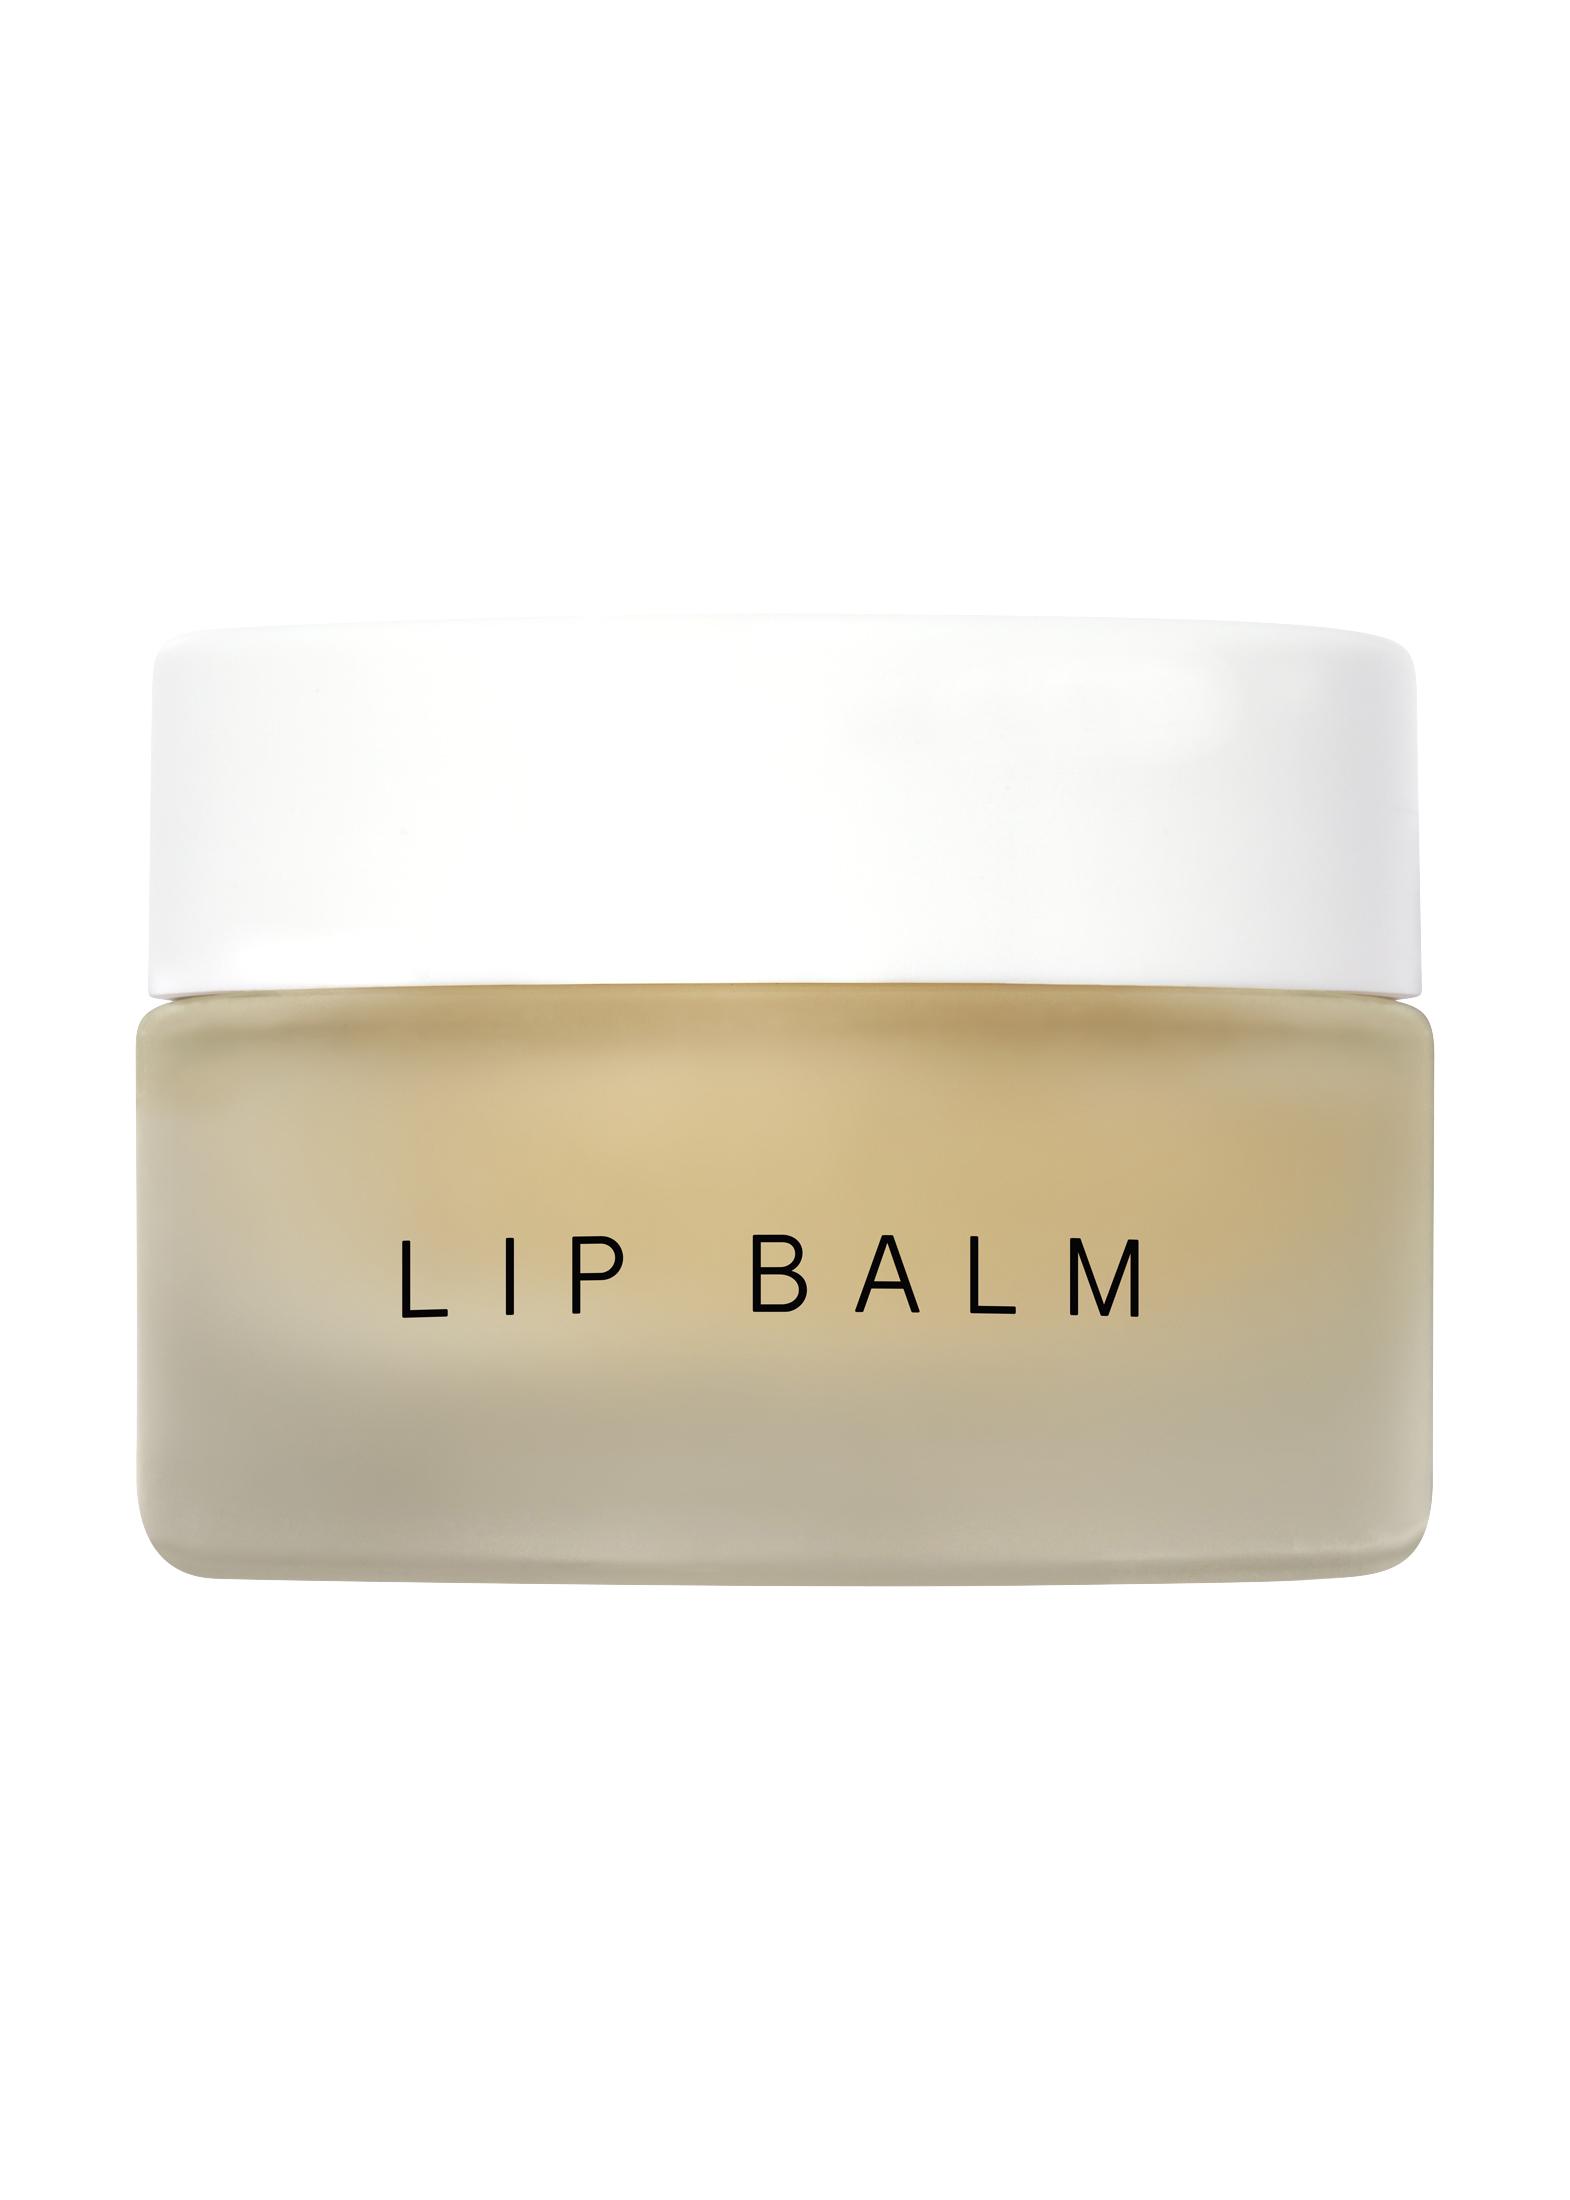 Lip Balm 12g image number 0